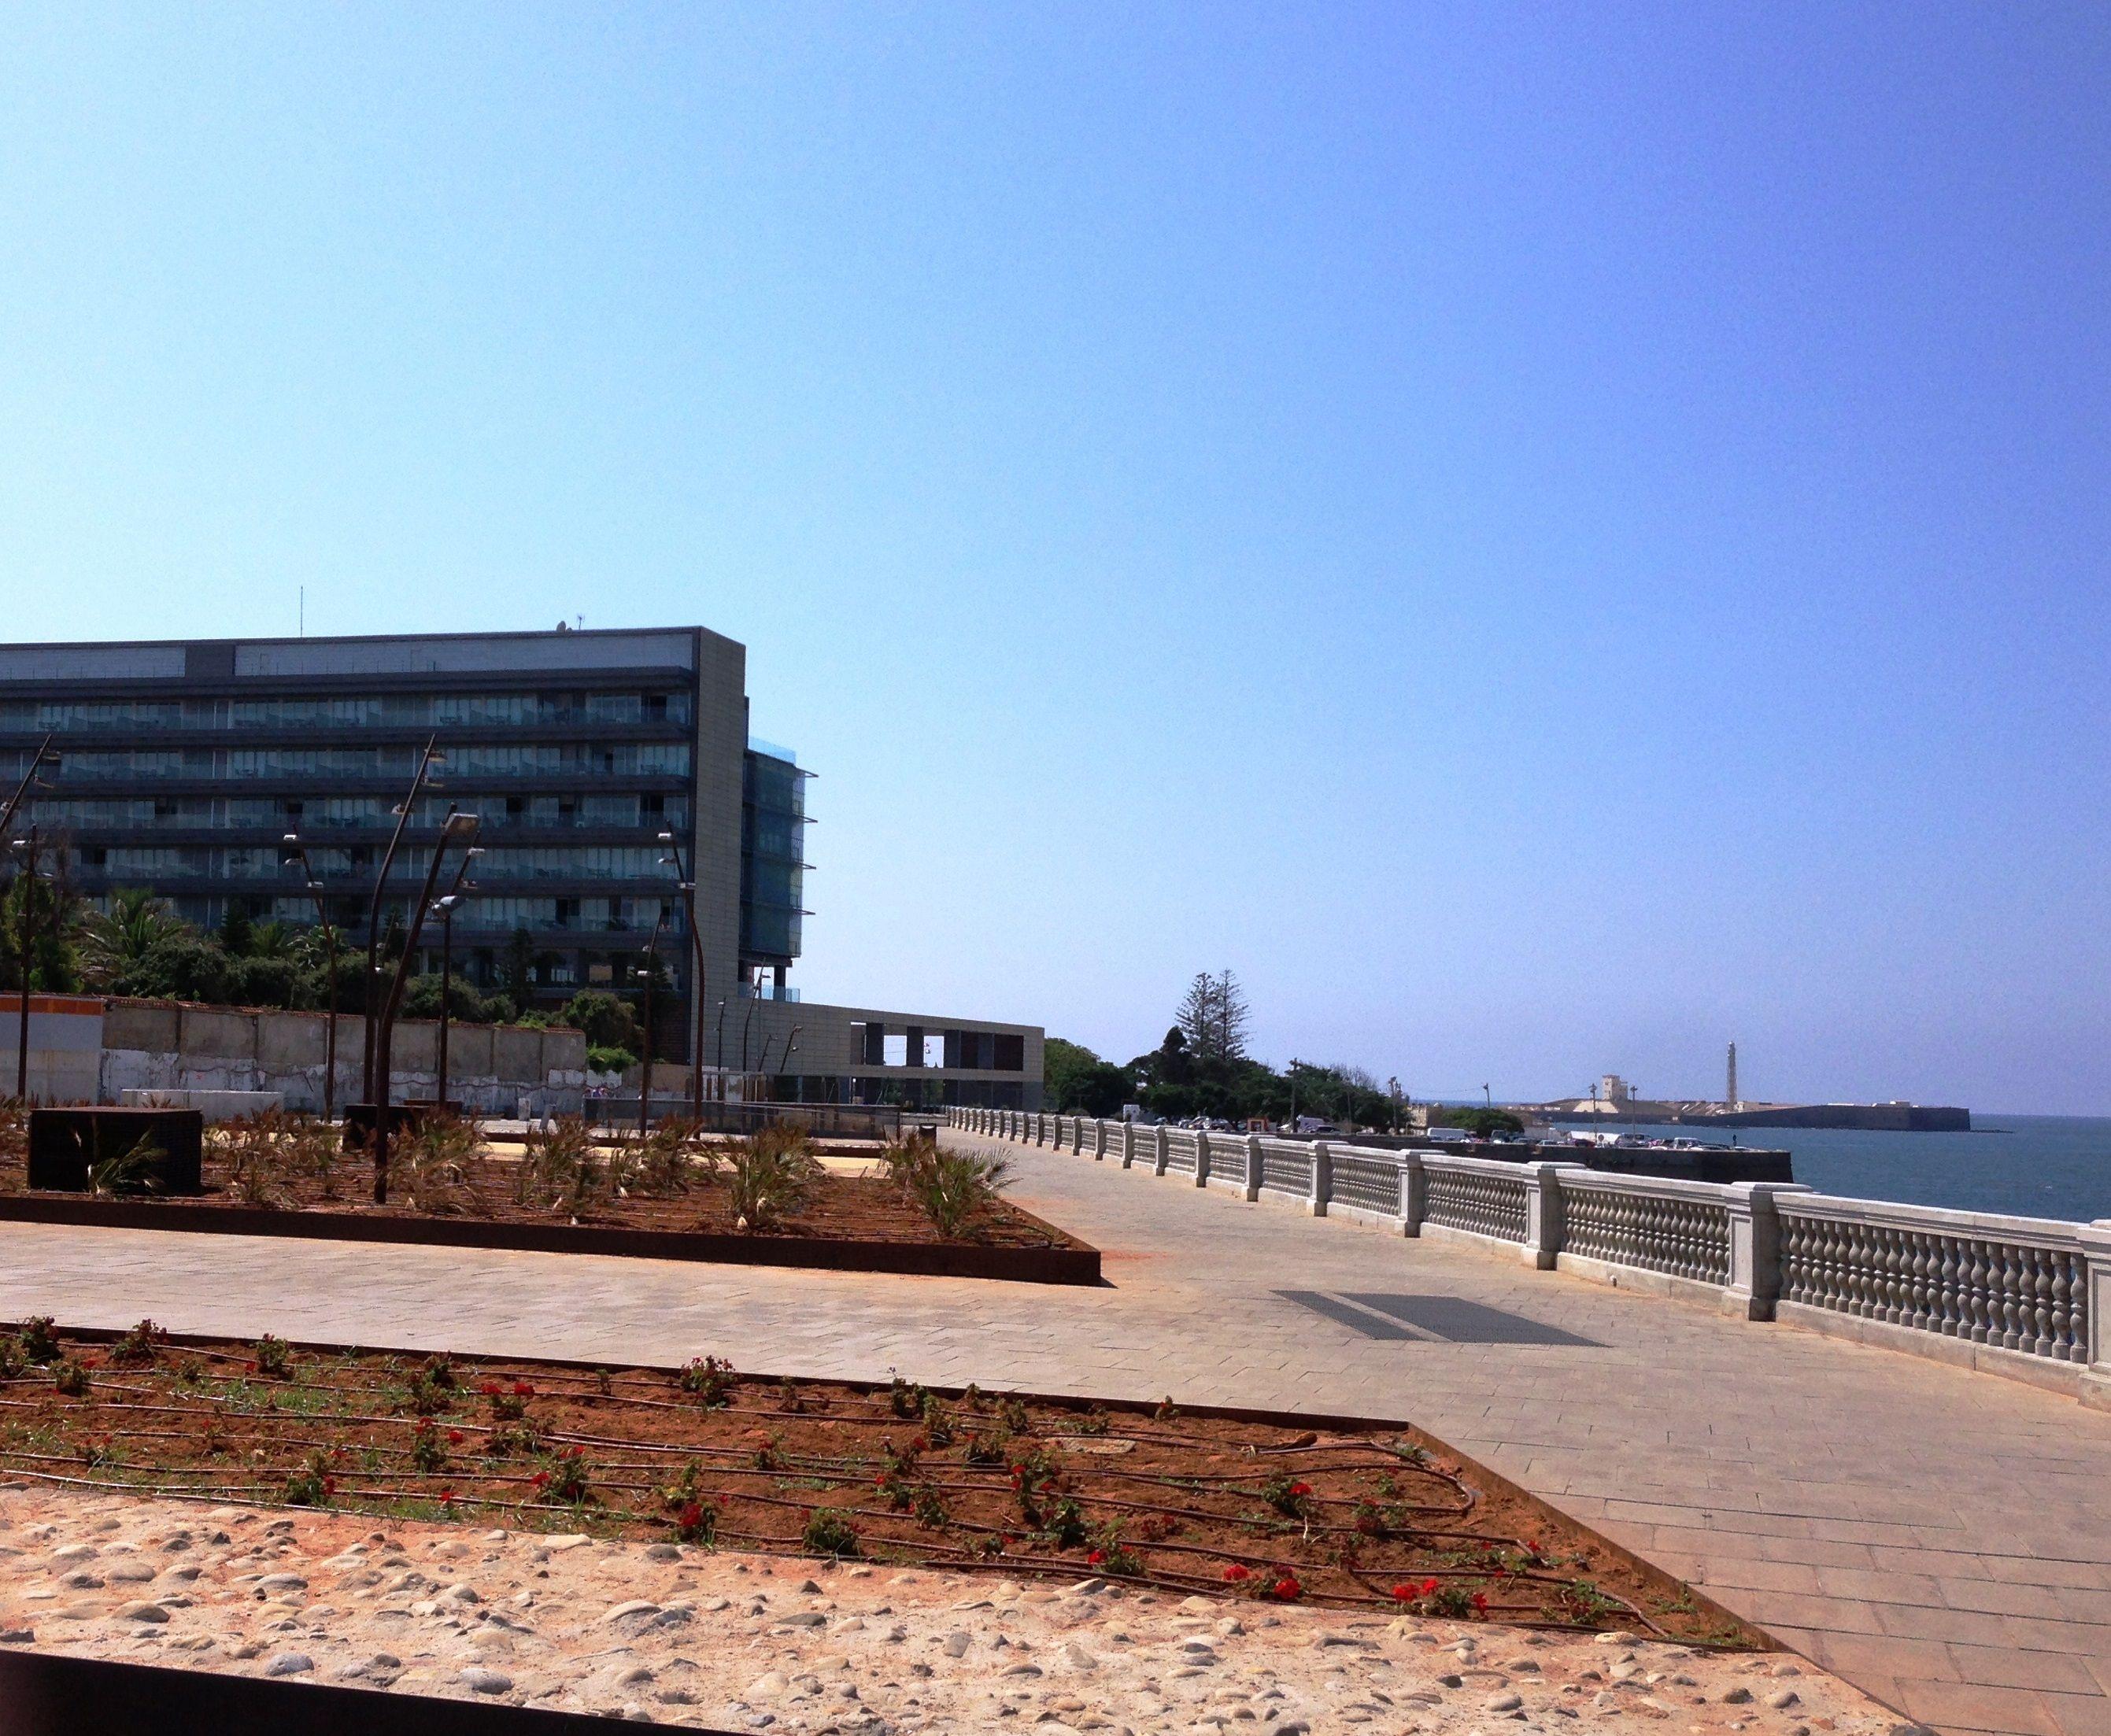 Parador Hotel Atlántico y castillo de San Sebastián, Cádiz